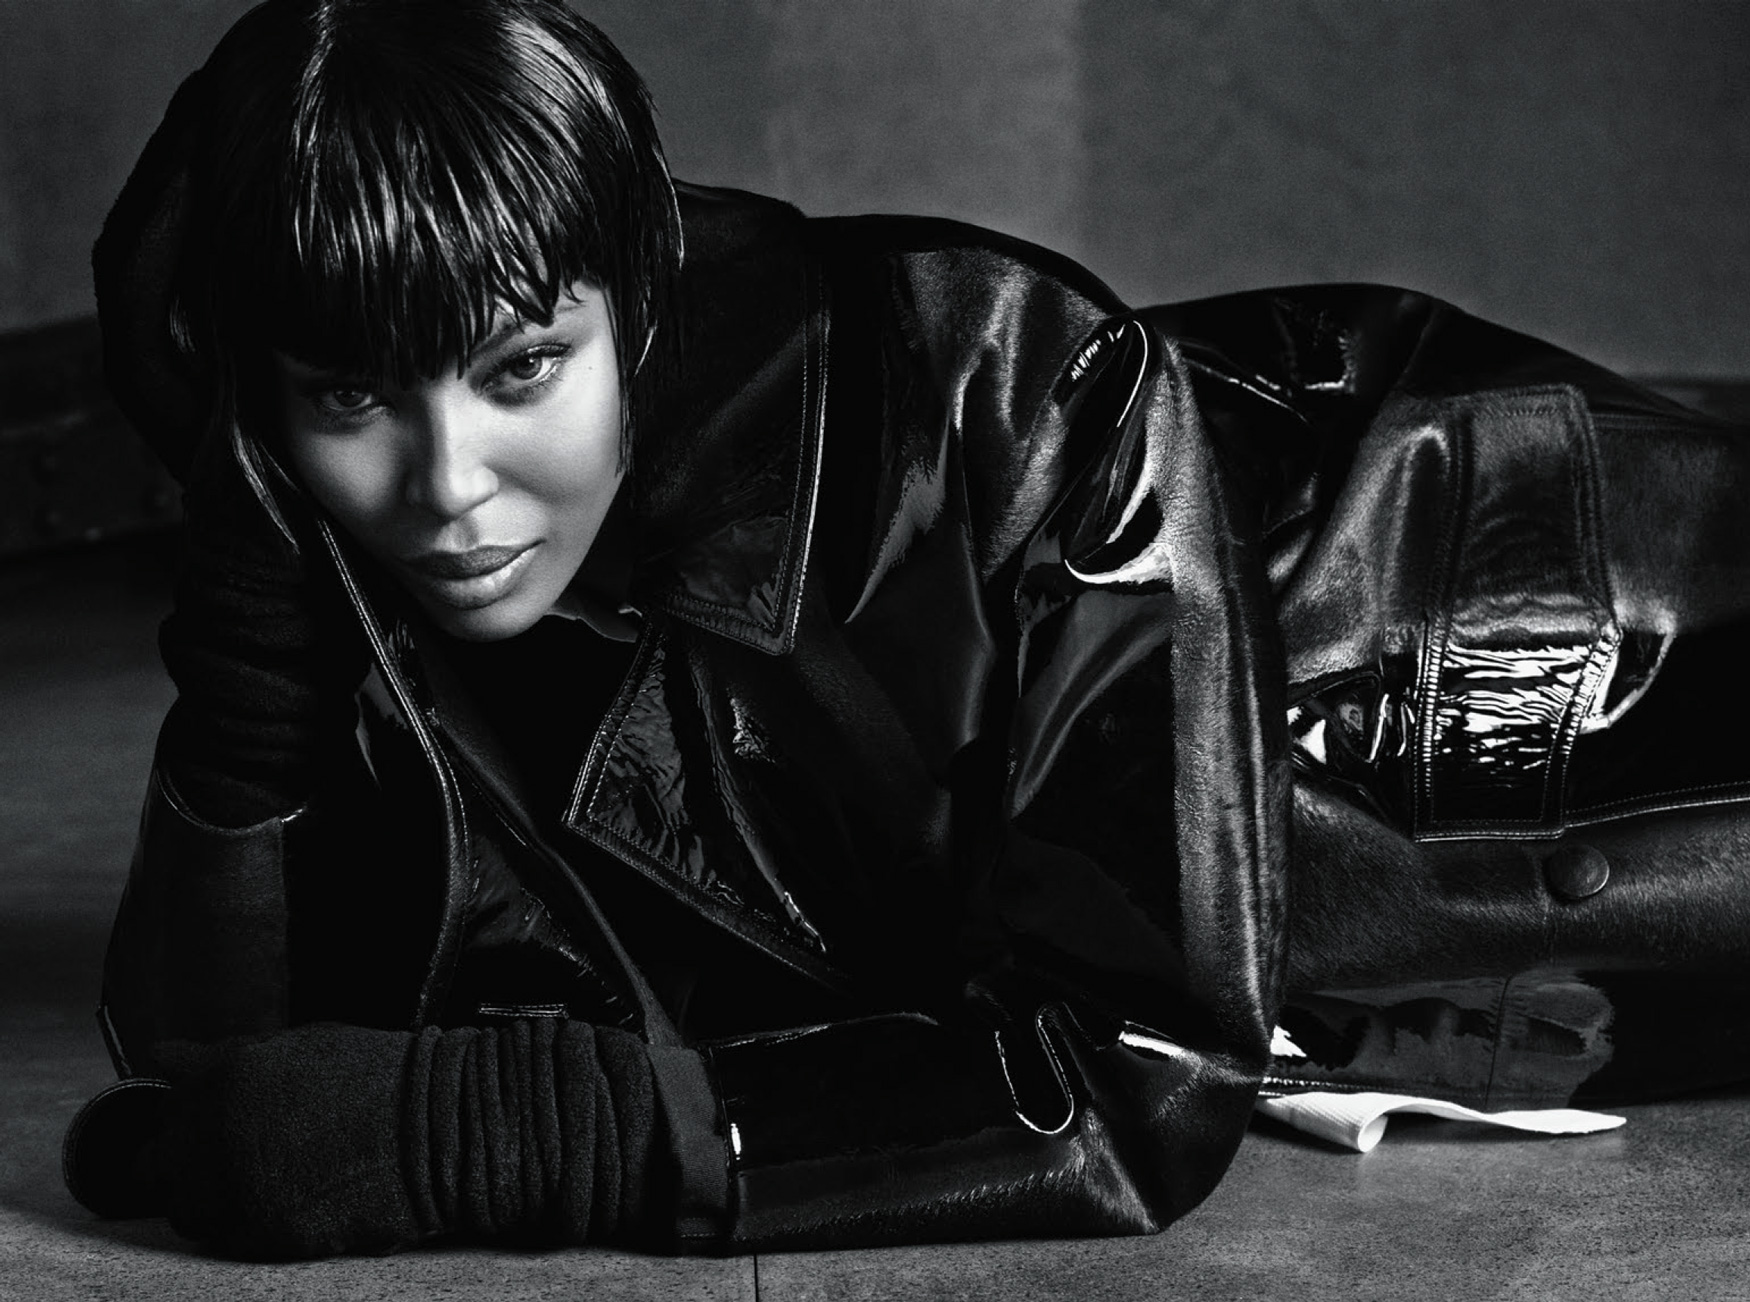 Giovanna-Battaglia-The-Icons-Of-Perfections-Vogue-Japan-15th-Anniversary-Issue-Luigi-Iango-V181_256_200-12.jpg